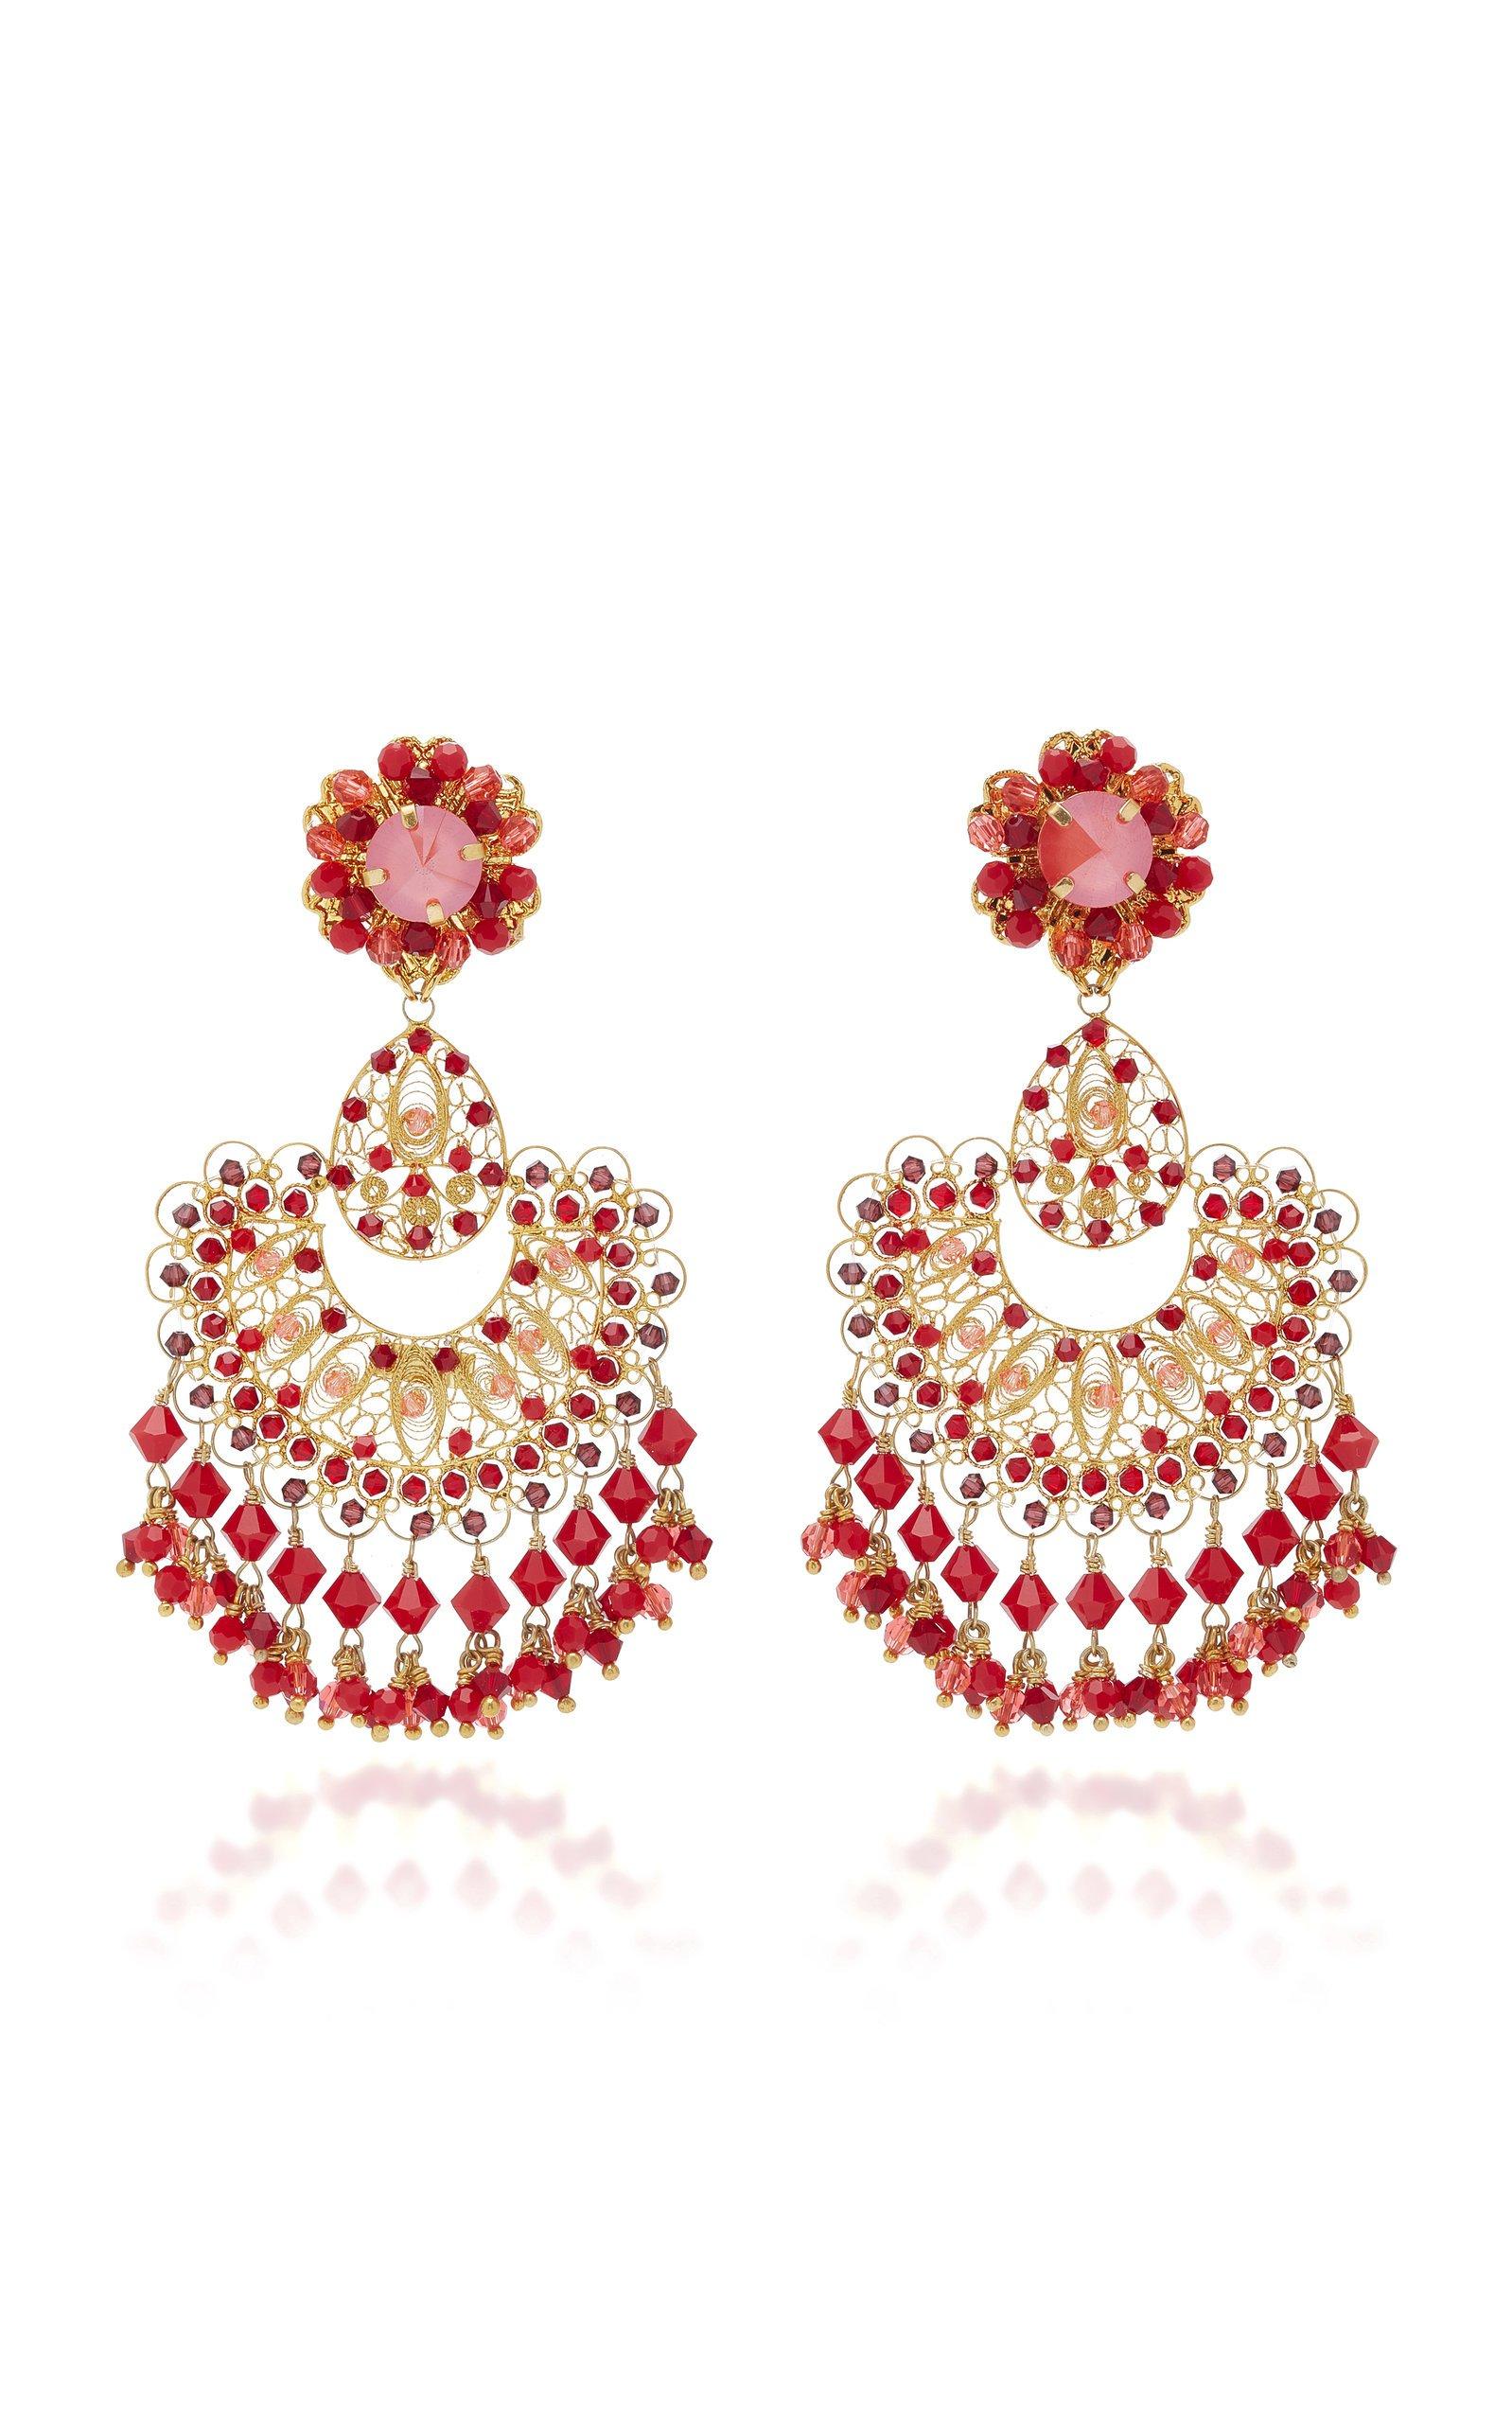 Red Coral Filigree Earring by Silvia Tcherassi   Moda Operandi